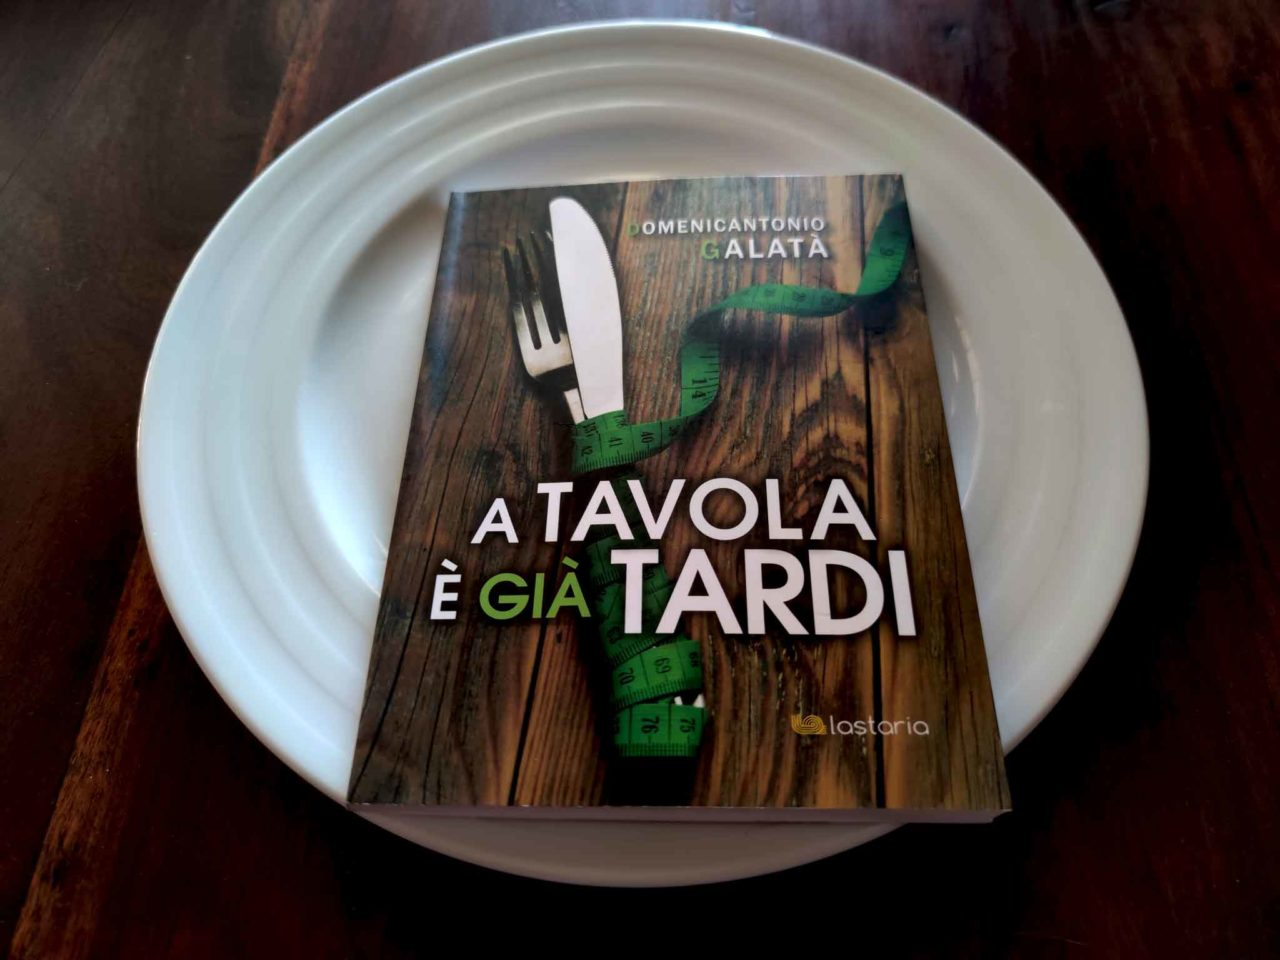 A tavola è già tardi di Antonio Galatà